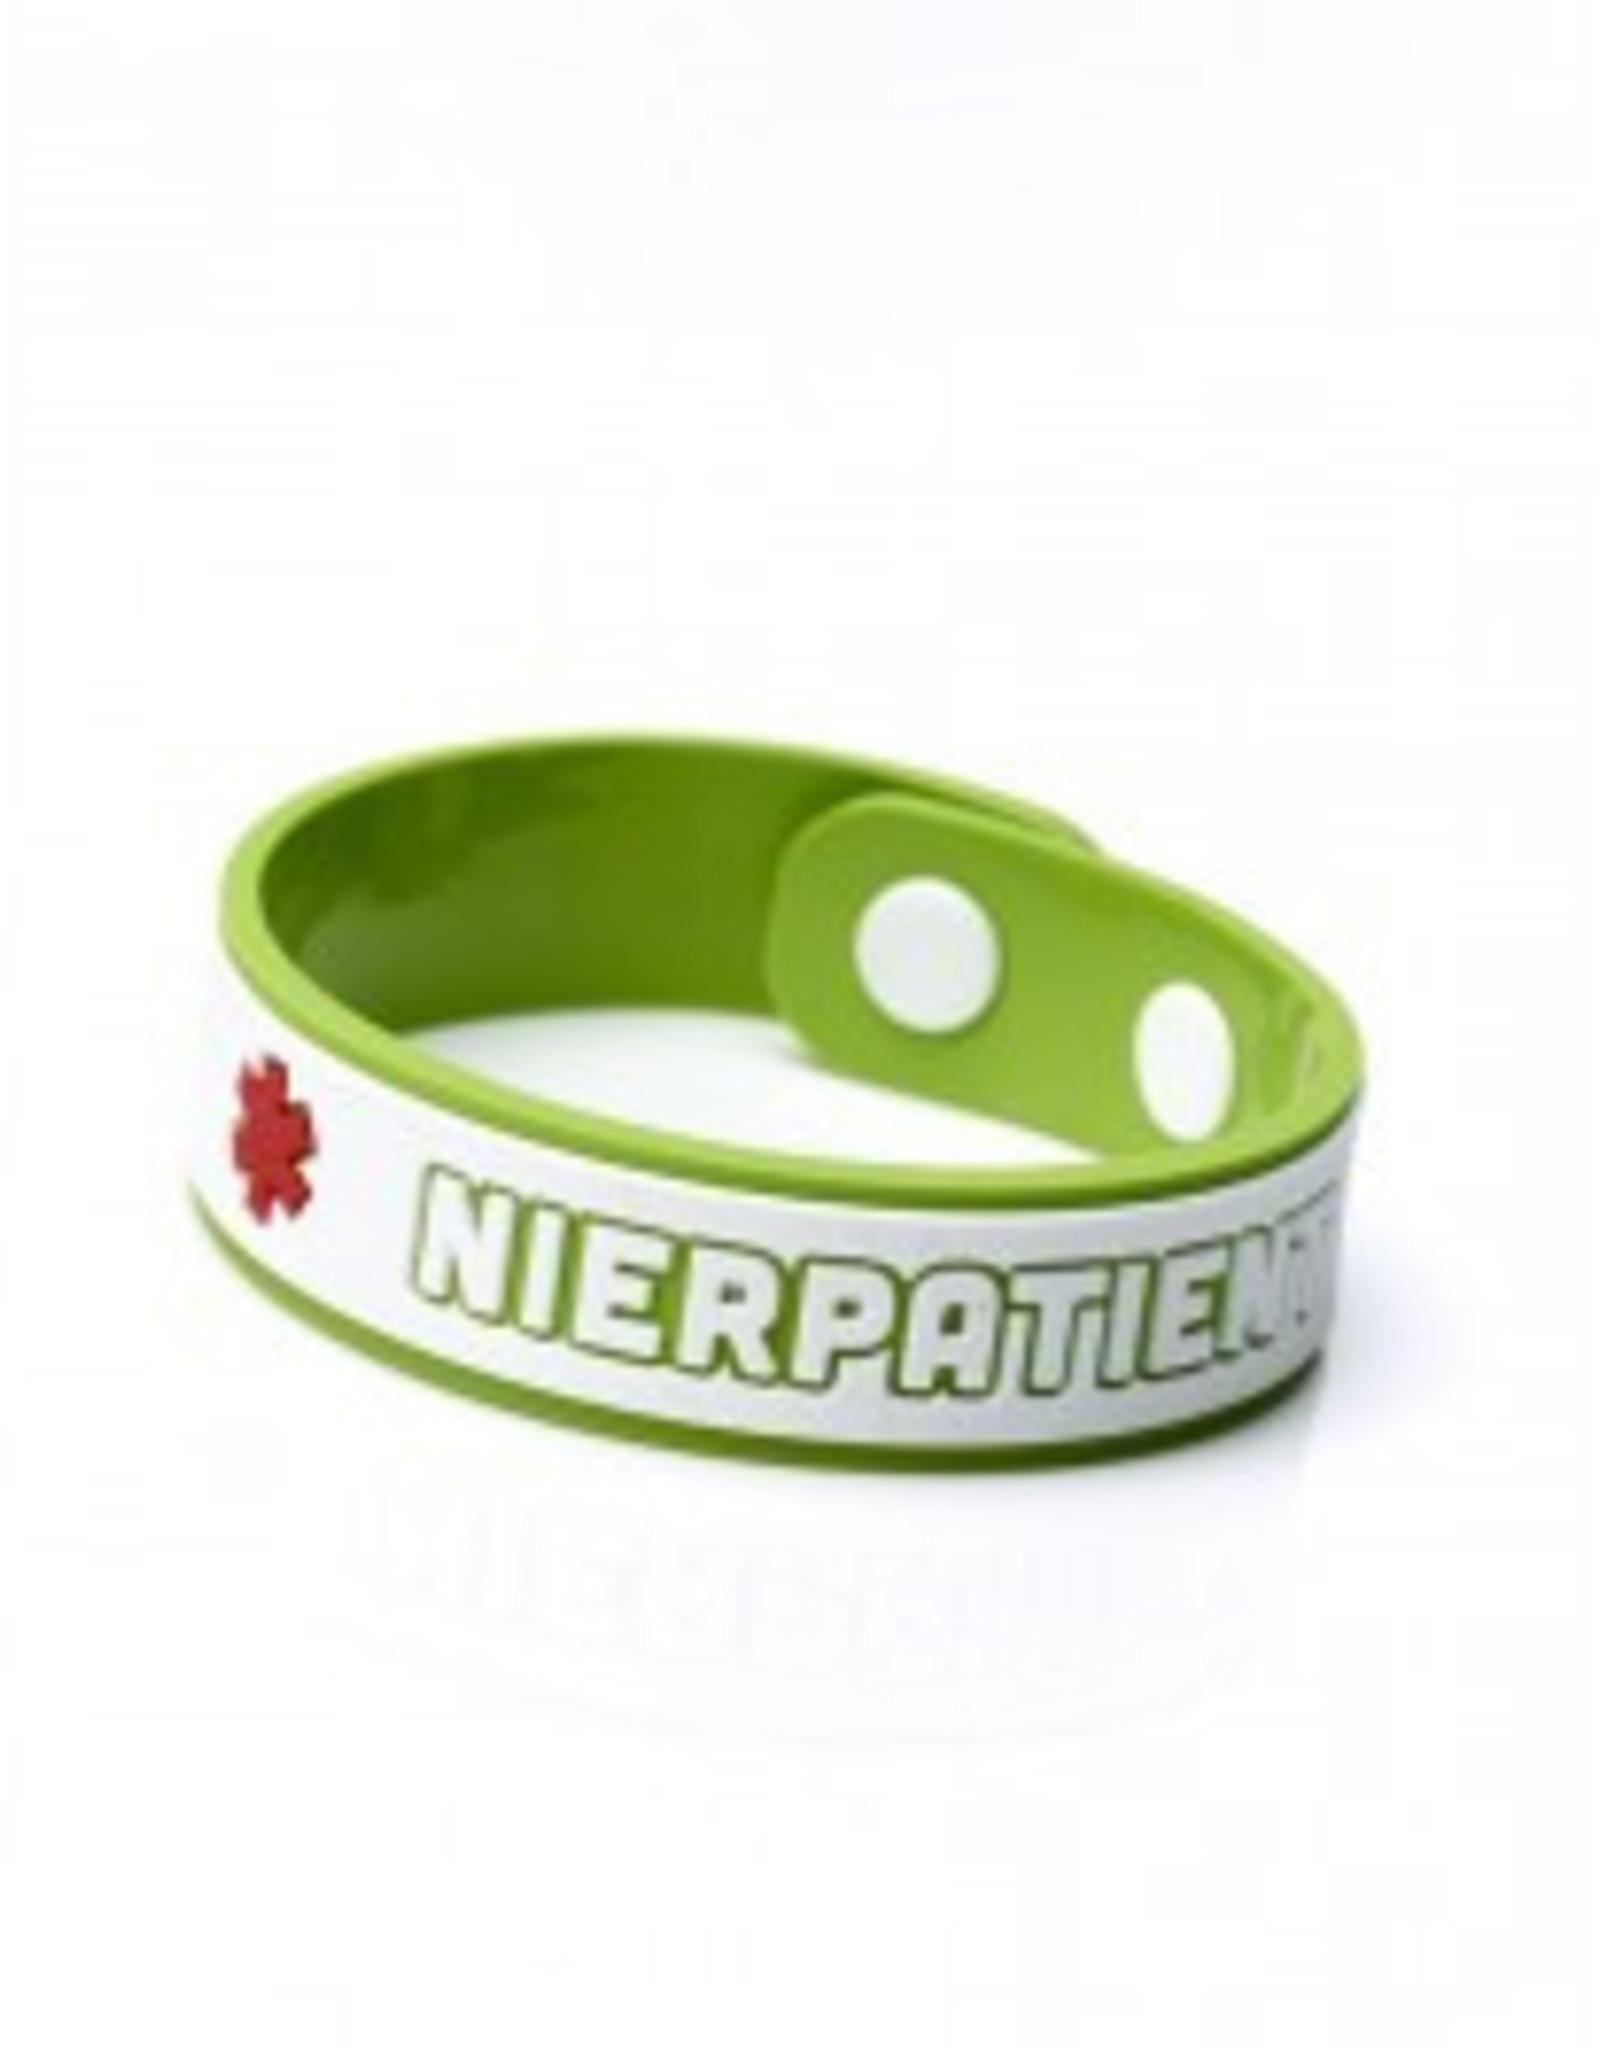 Allergy Bracelets for adults